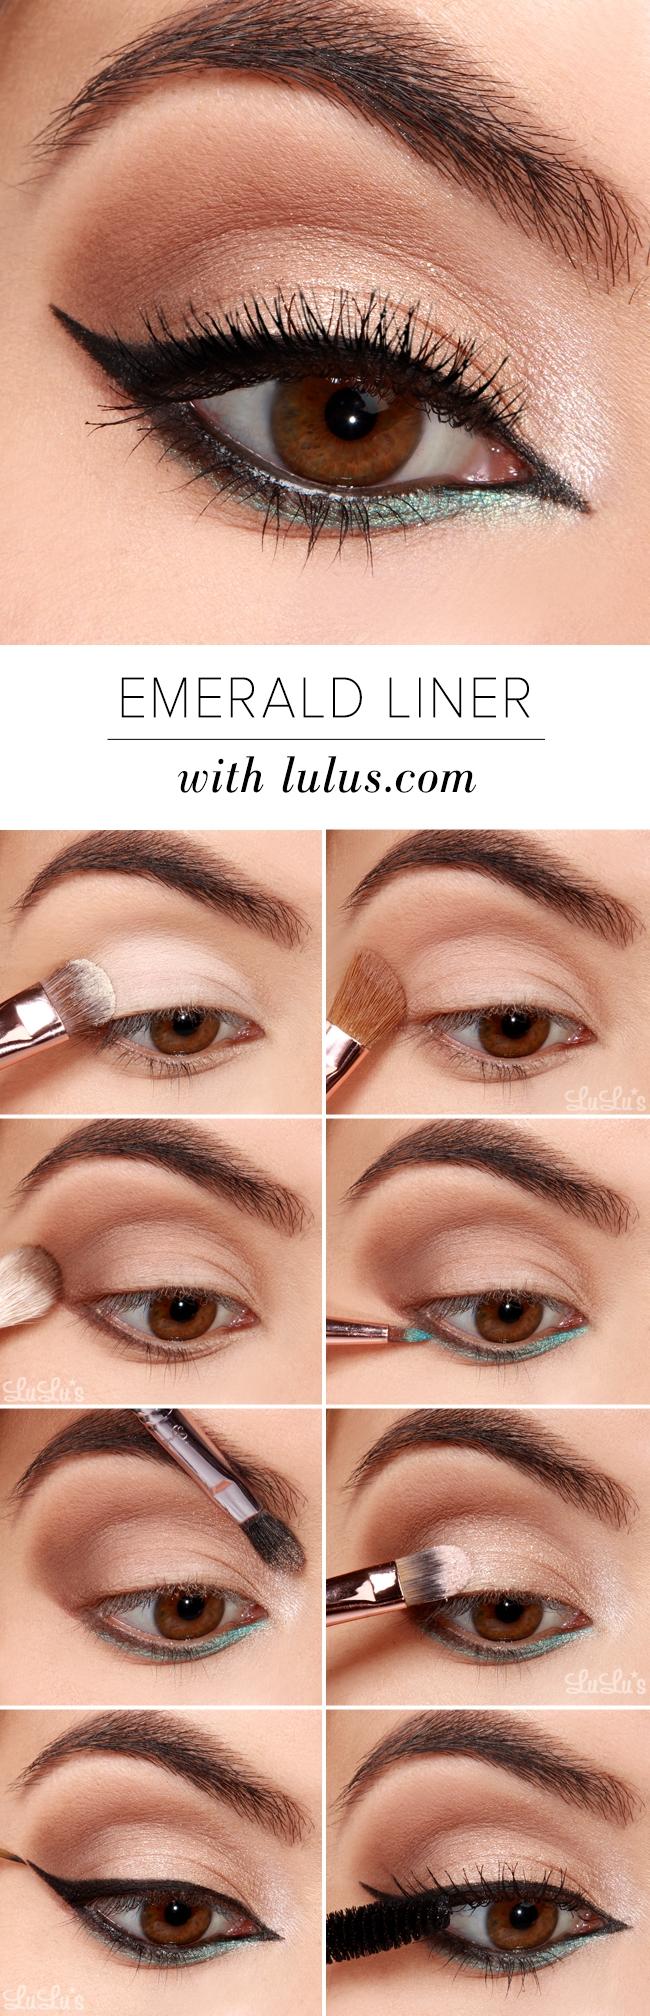 emerald-liner-cat-eyes-